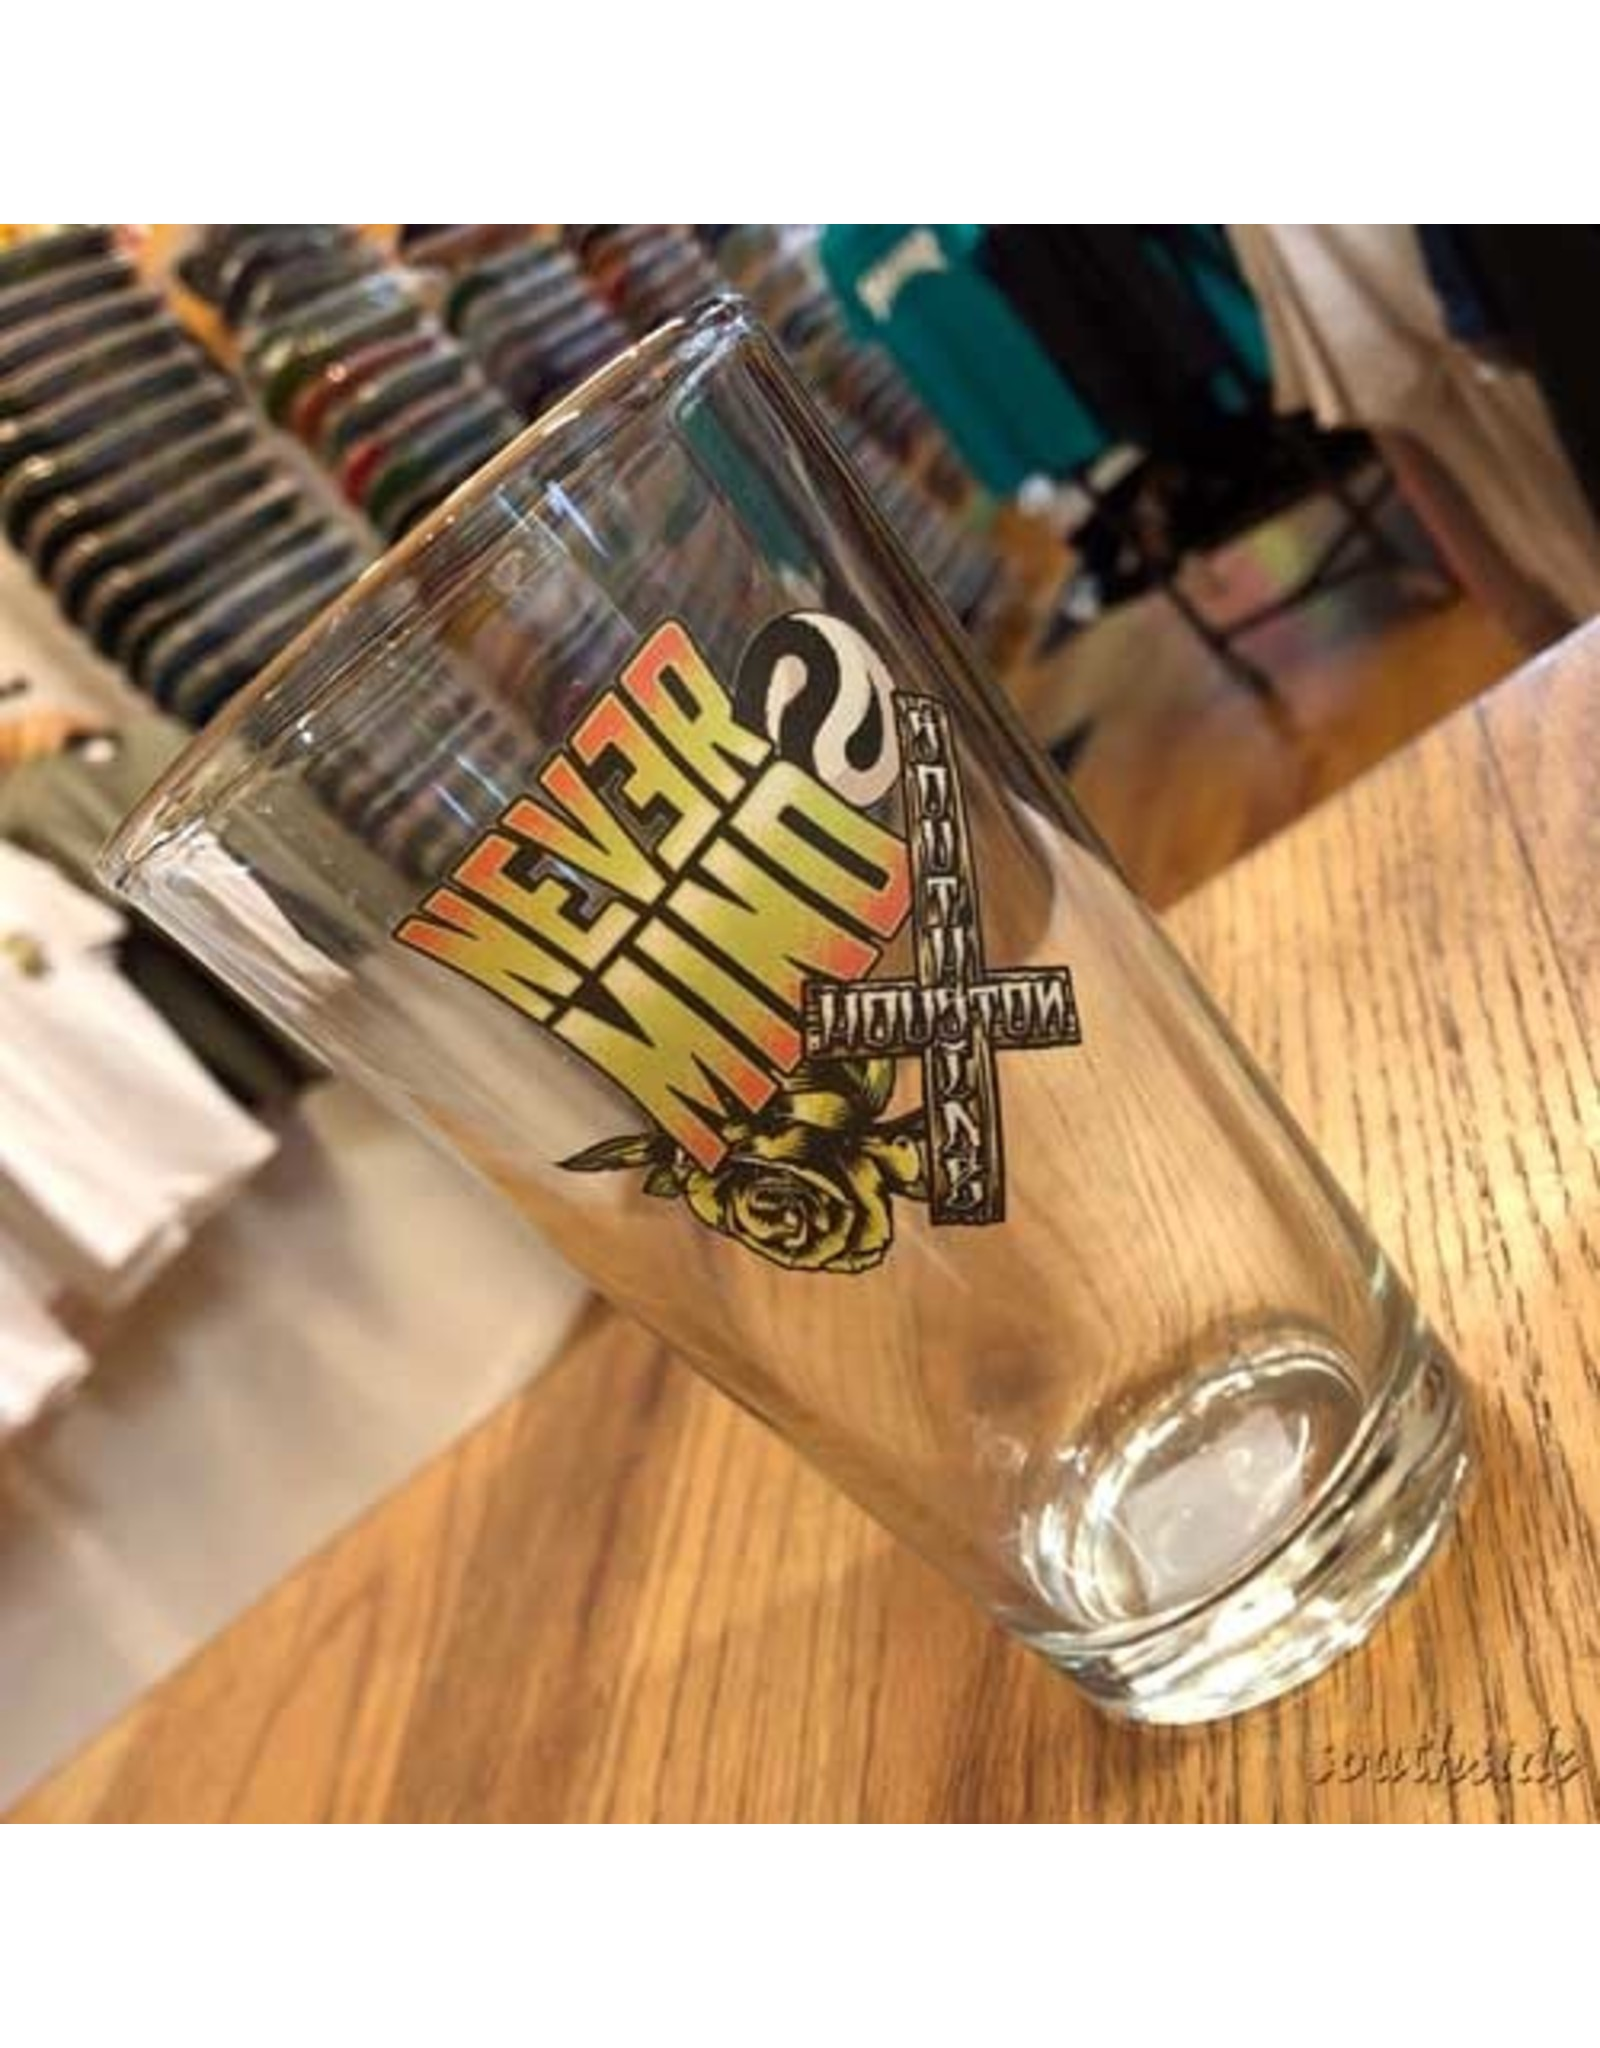 Southside Southside Nevermind Pint Glass